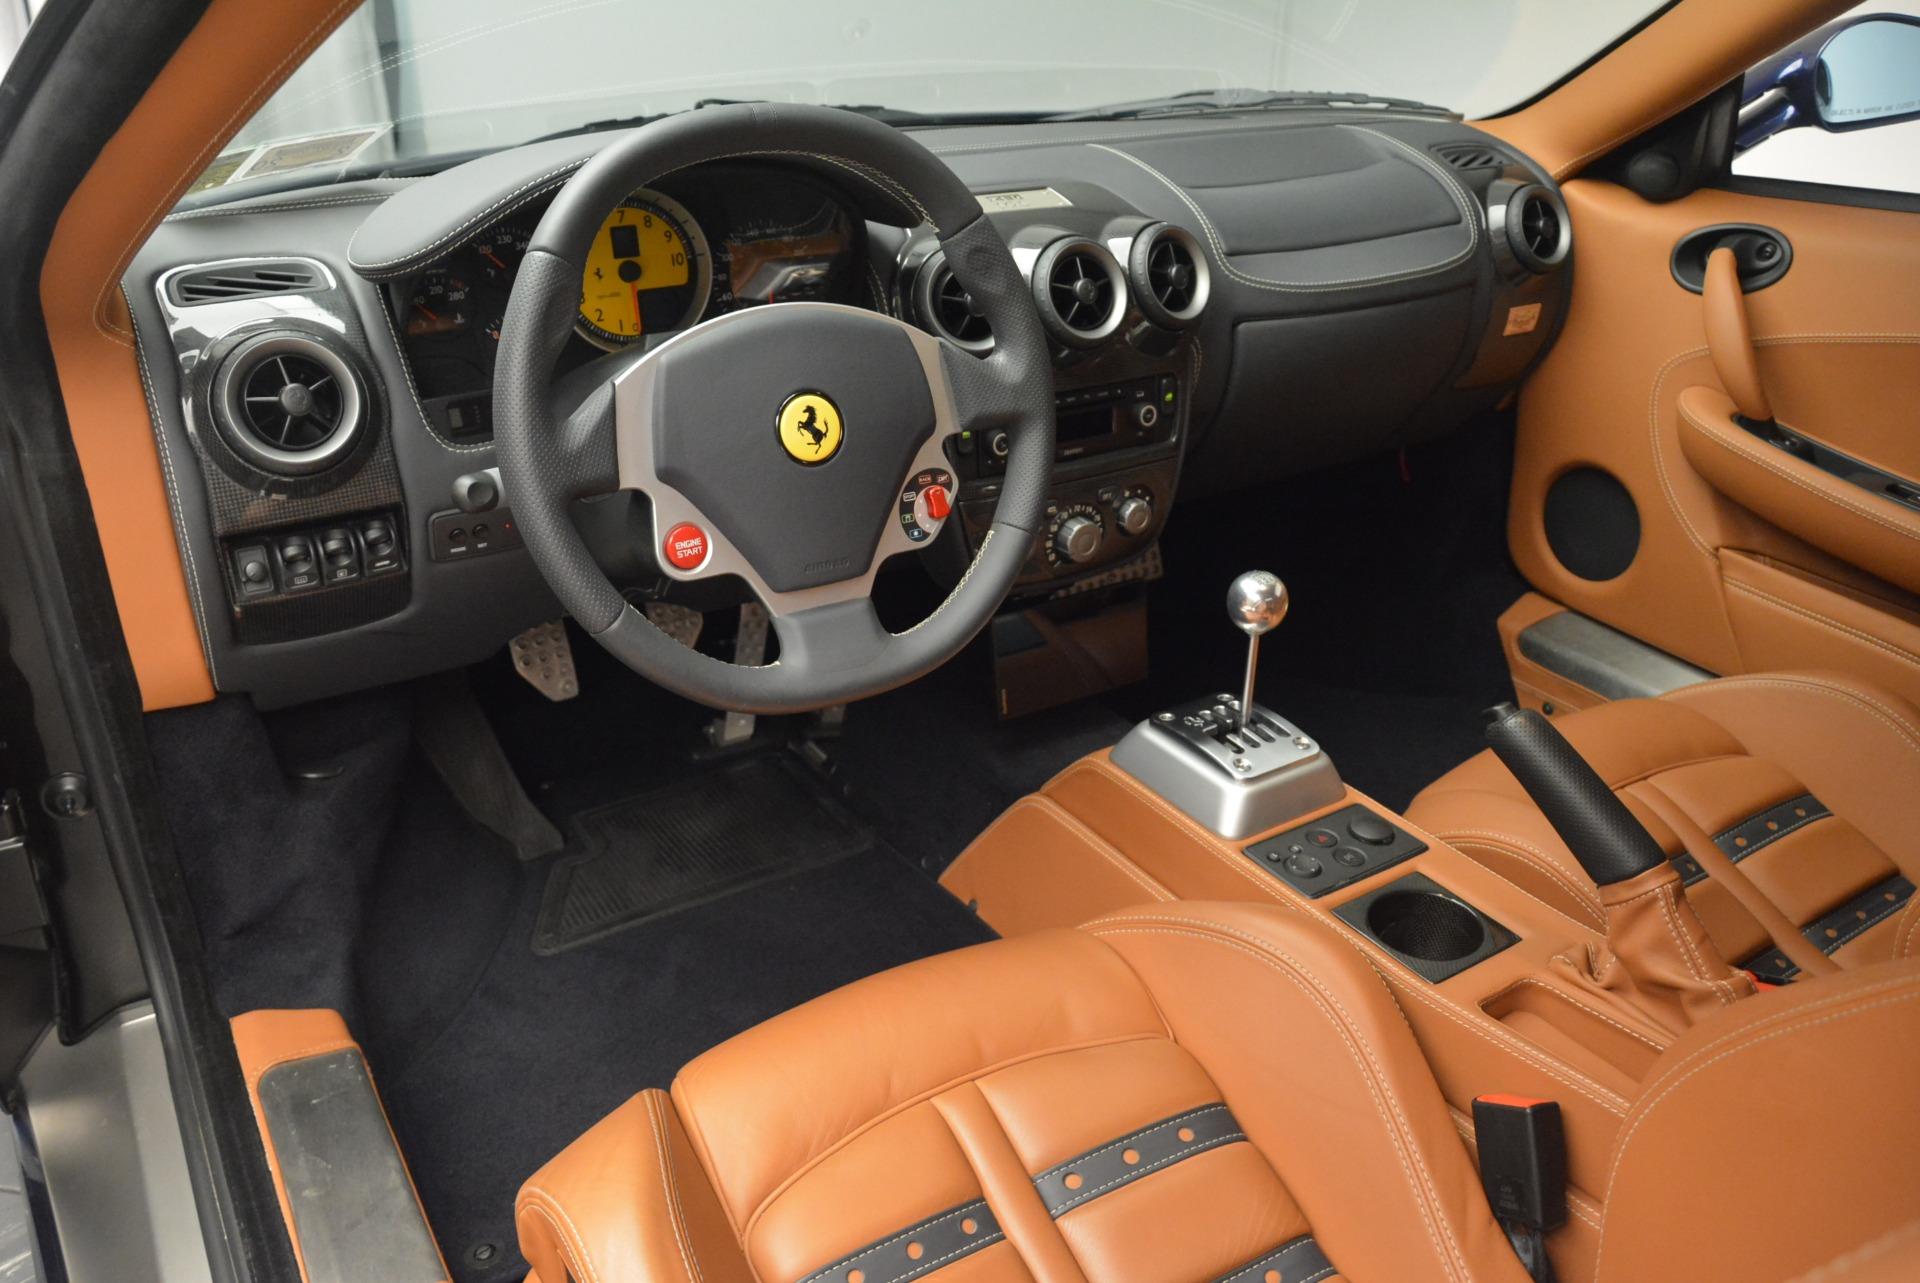 Used 2009 Ferrari F430 6-Speed Manual For Sale In Westport, CT 2466_p14